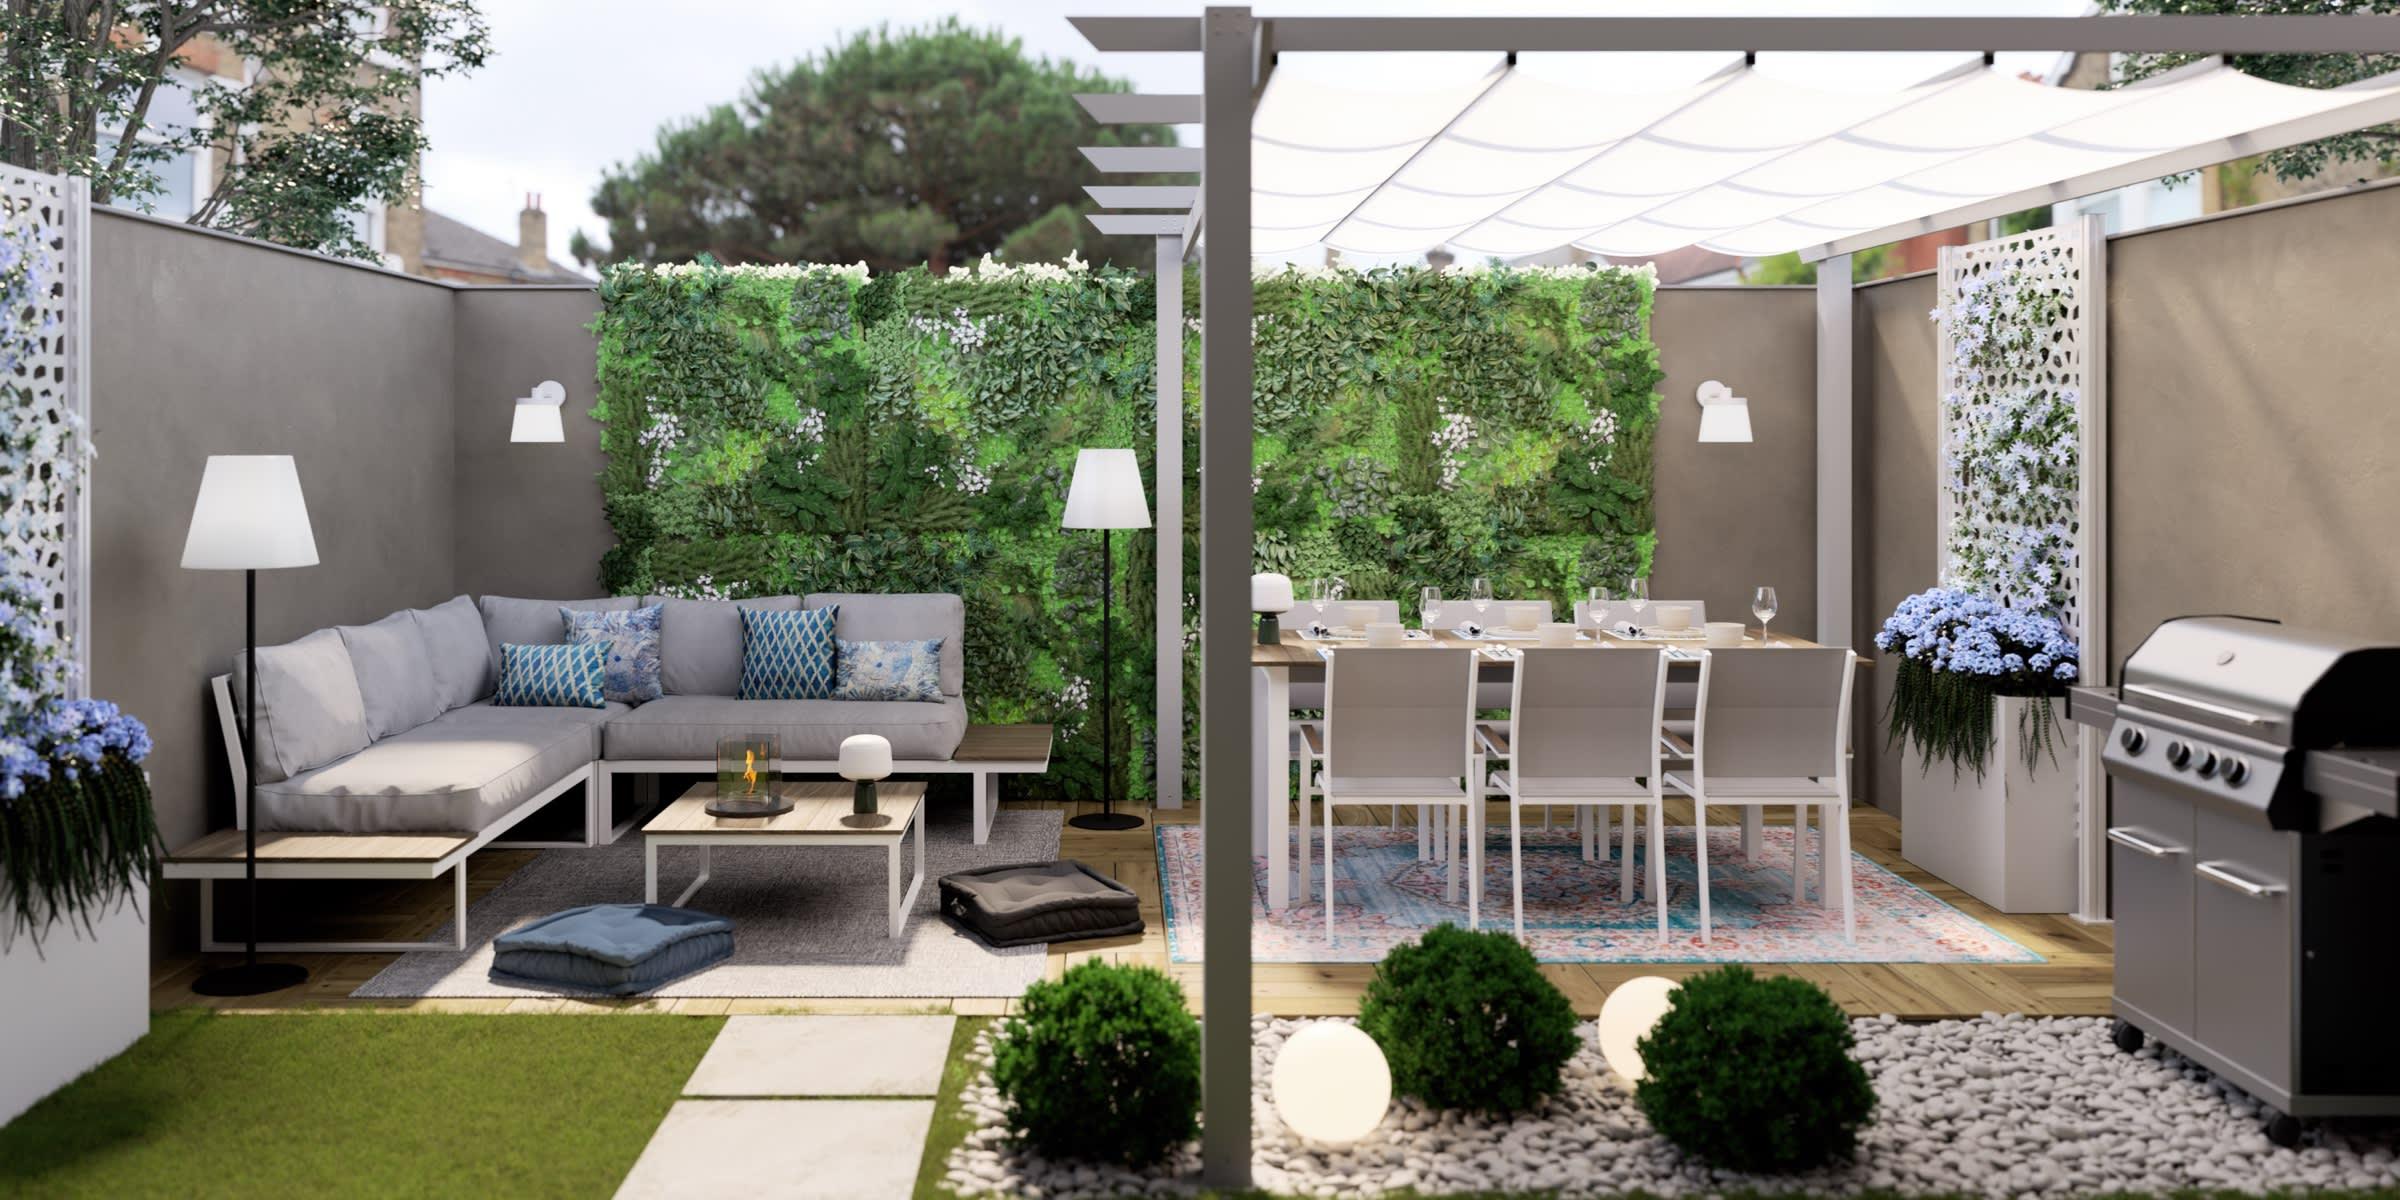 idee-giardino-piccolo-moderno